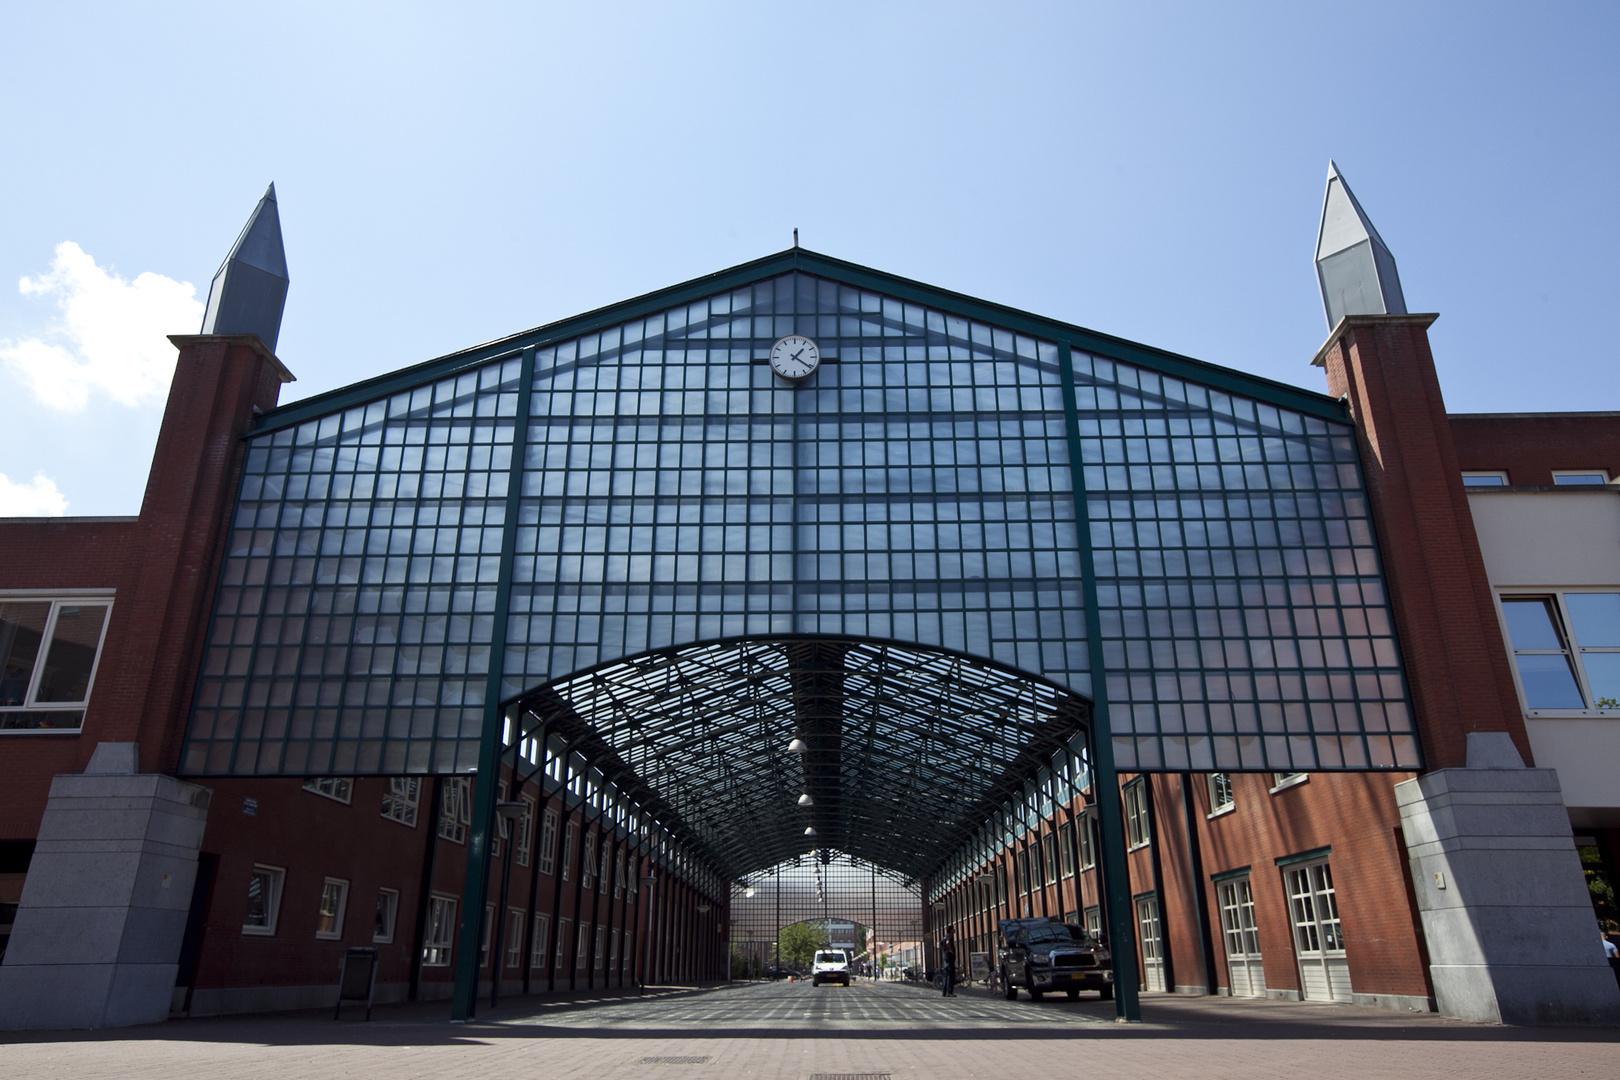 NL_TheHague_Thijssestraat_2012_RS-17.jpg